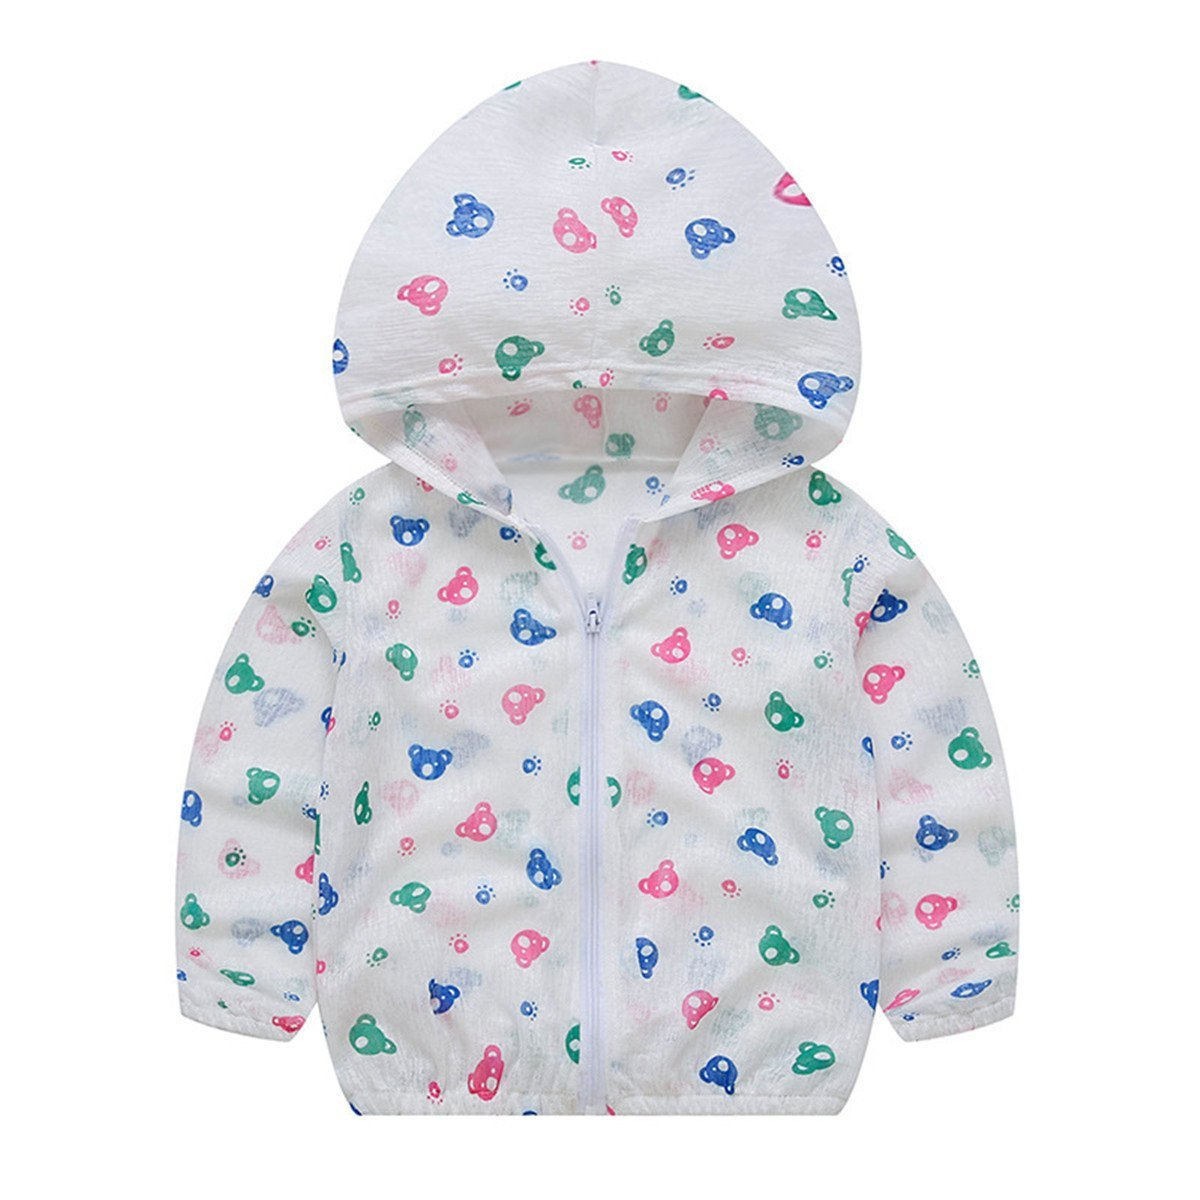 0e8c667ef Amazon.com  Summer Baby Boys Girls Jacket Breathable Longsleeves ...